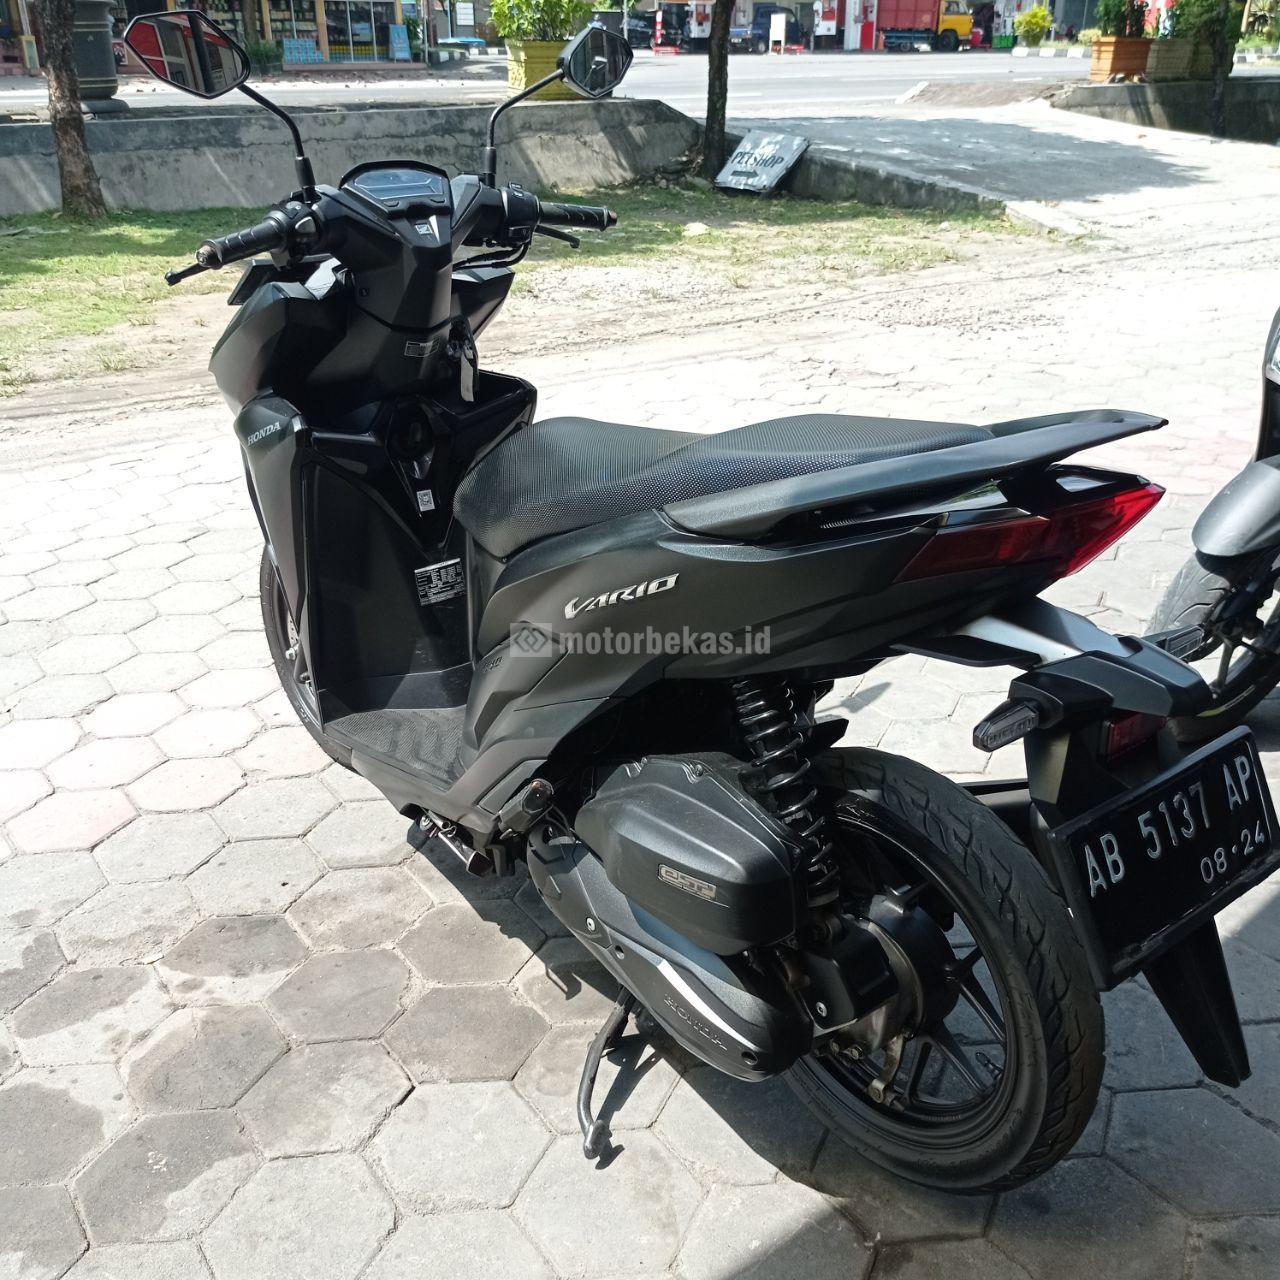 HONDA VARIO 125  528 motorbekas.id